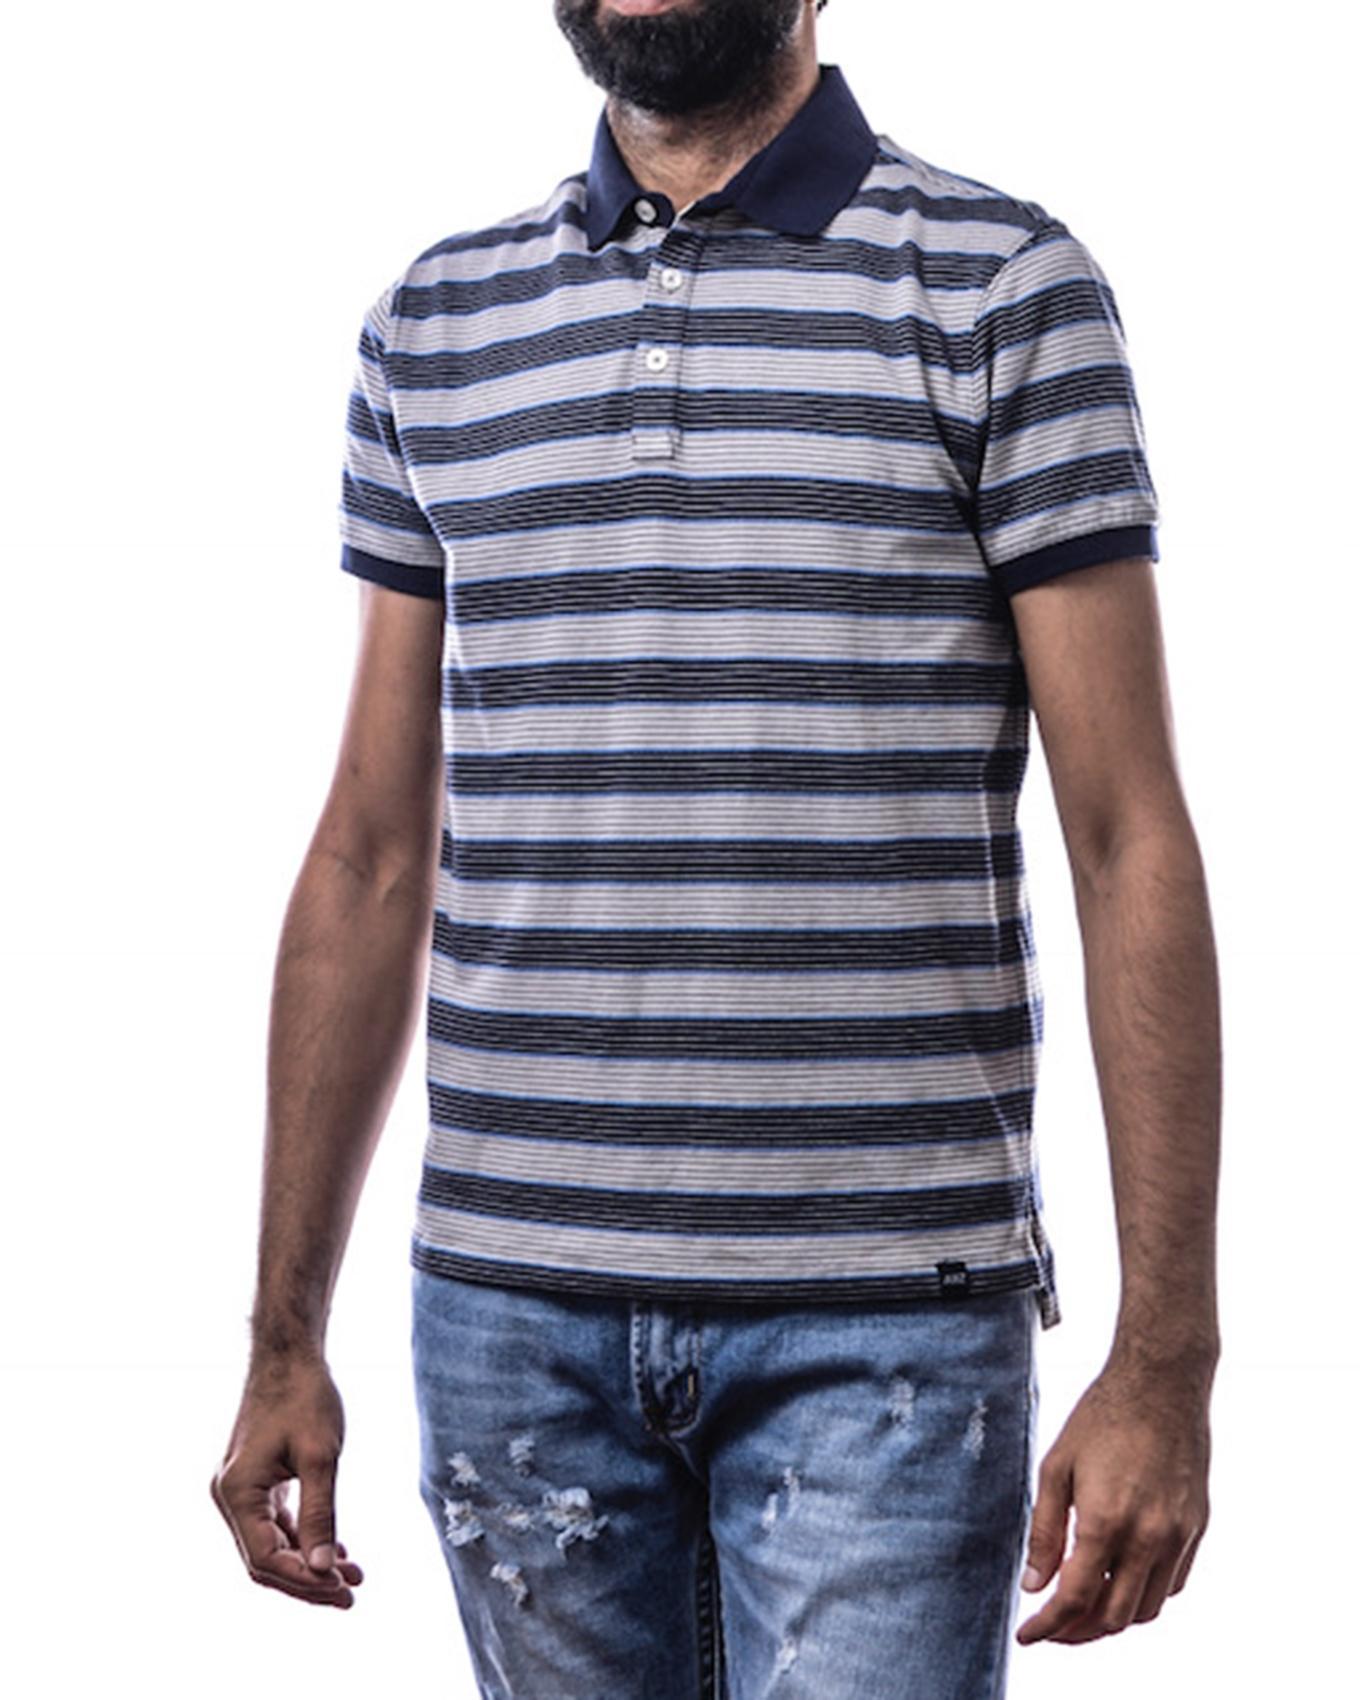 Mens Polo Shirts At Best Prices In Sri Lanka Kaos Polos Stripe Big Black T Shirt Grey Blue